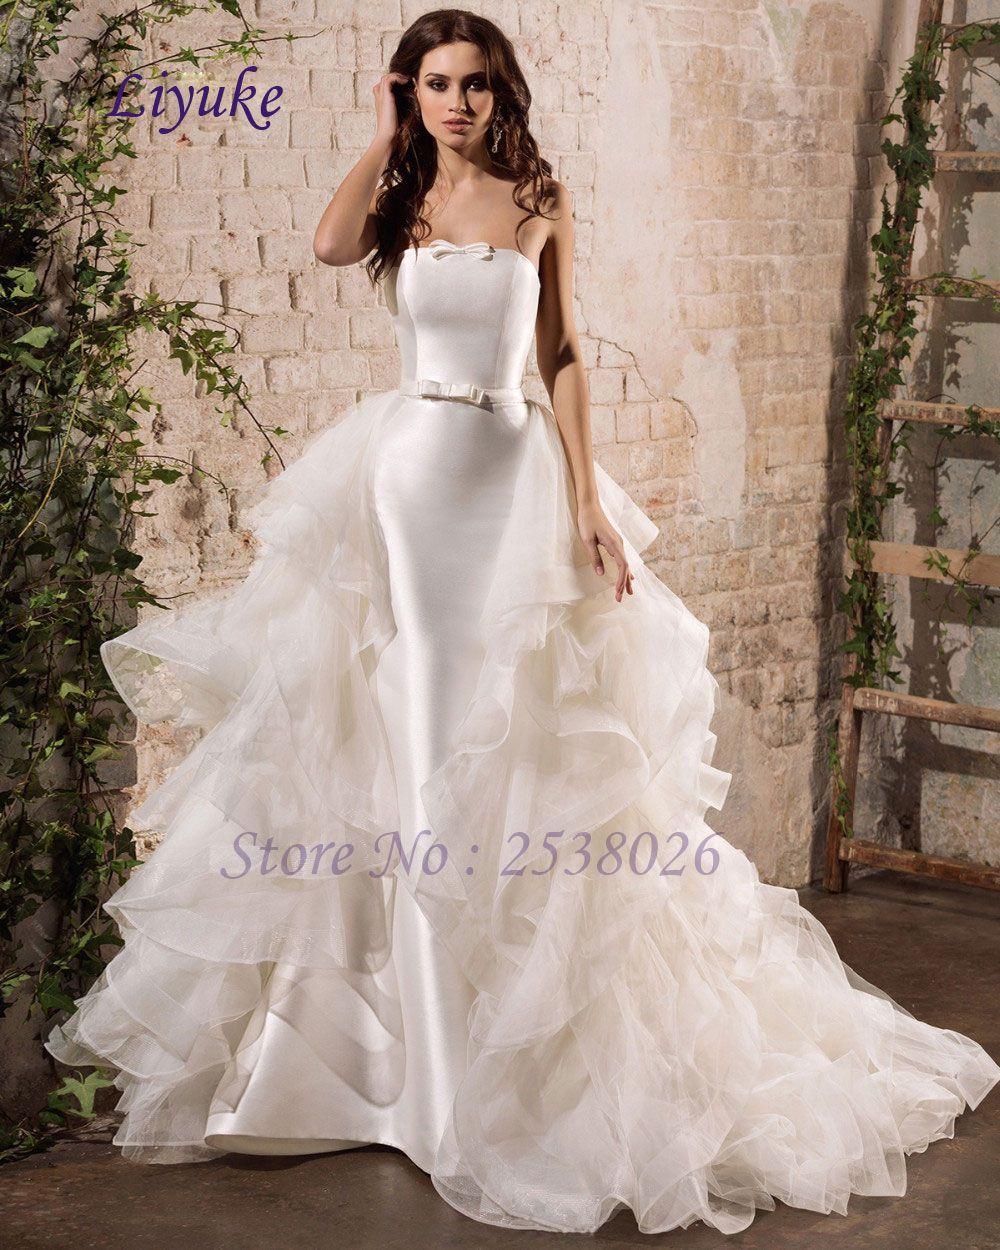 Liyuke j vestidos de novia custom made vintage satin mermaid